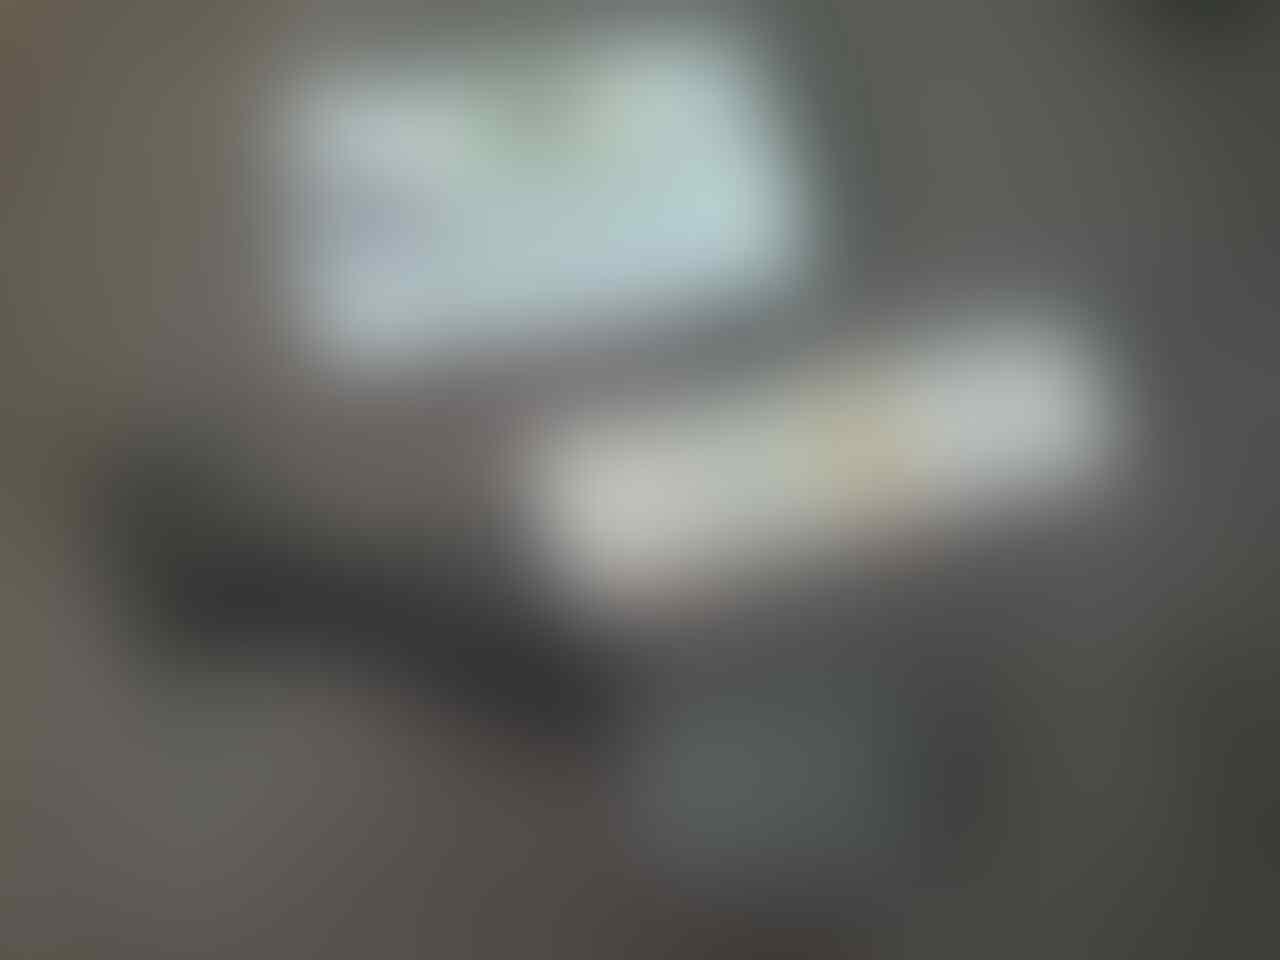 TV Tuner Combo TV box gadmei TV3488 Bekas Solo Murah